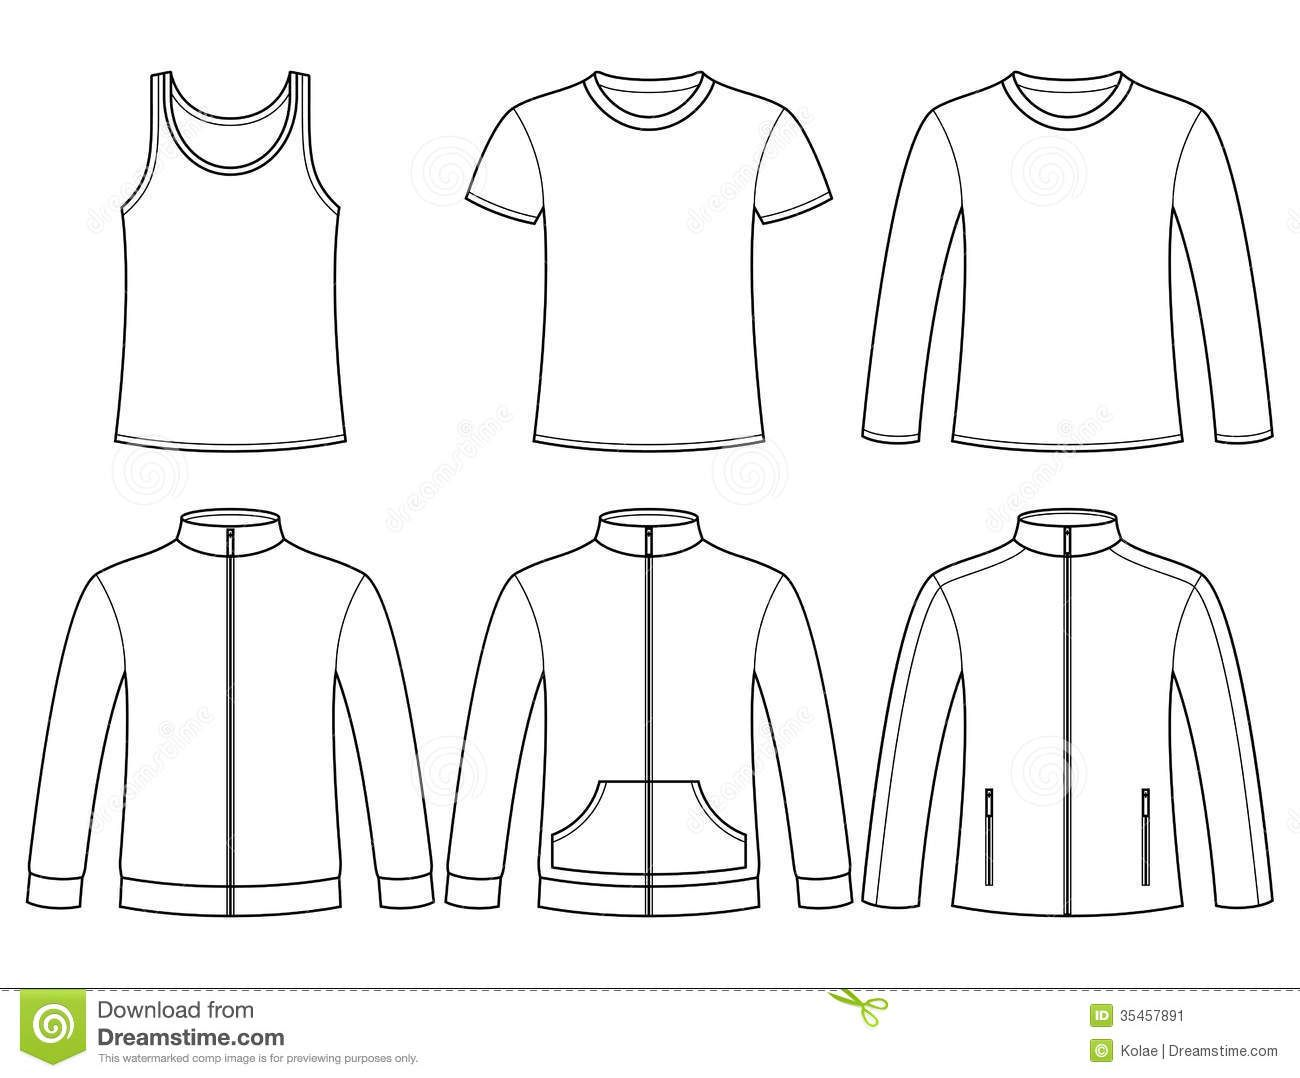 singlet-t-shirt-long-sleeved-t-shirt-sweatshirts-jacket-t-template-isolated-white-background-35457891.jpg 1,300×1,078 pixels